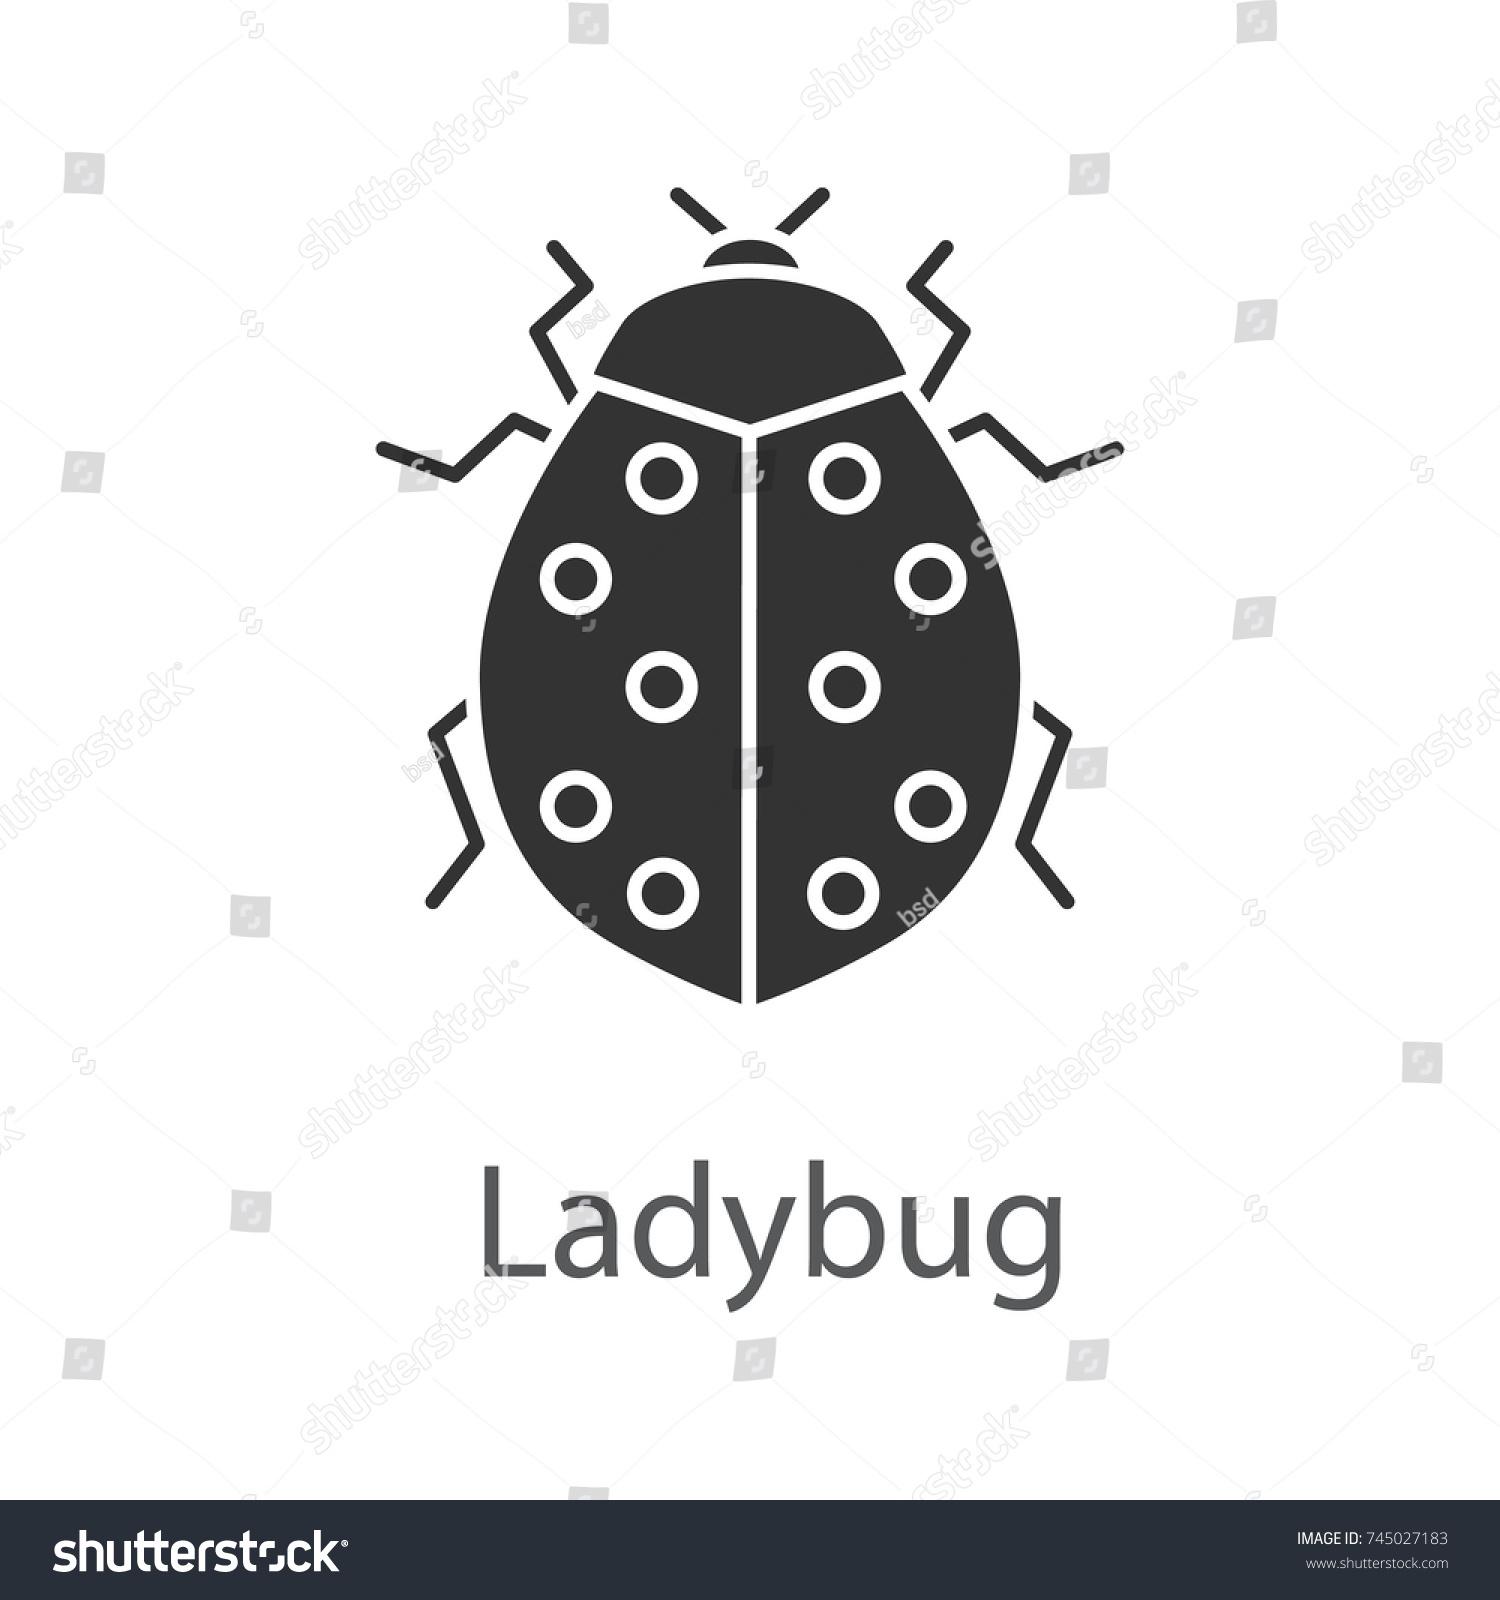 Ladybug Glyph Icon Ladybird Insect Silhouette Stock Vector (Royalty ...